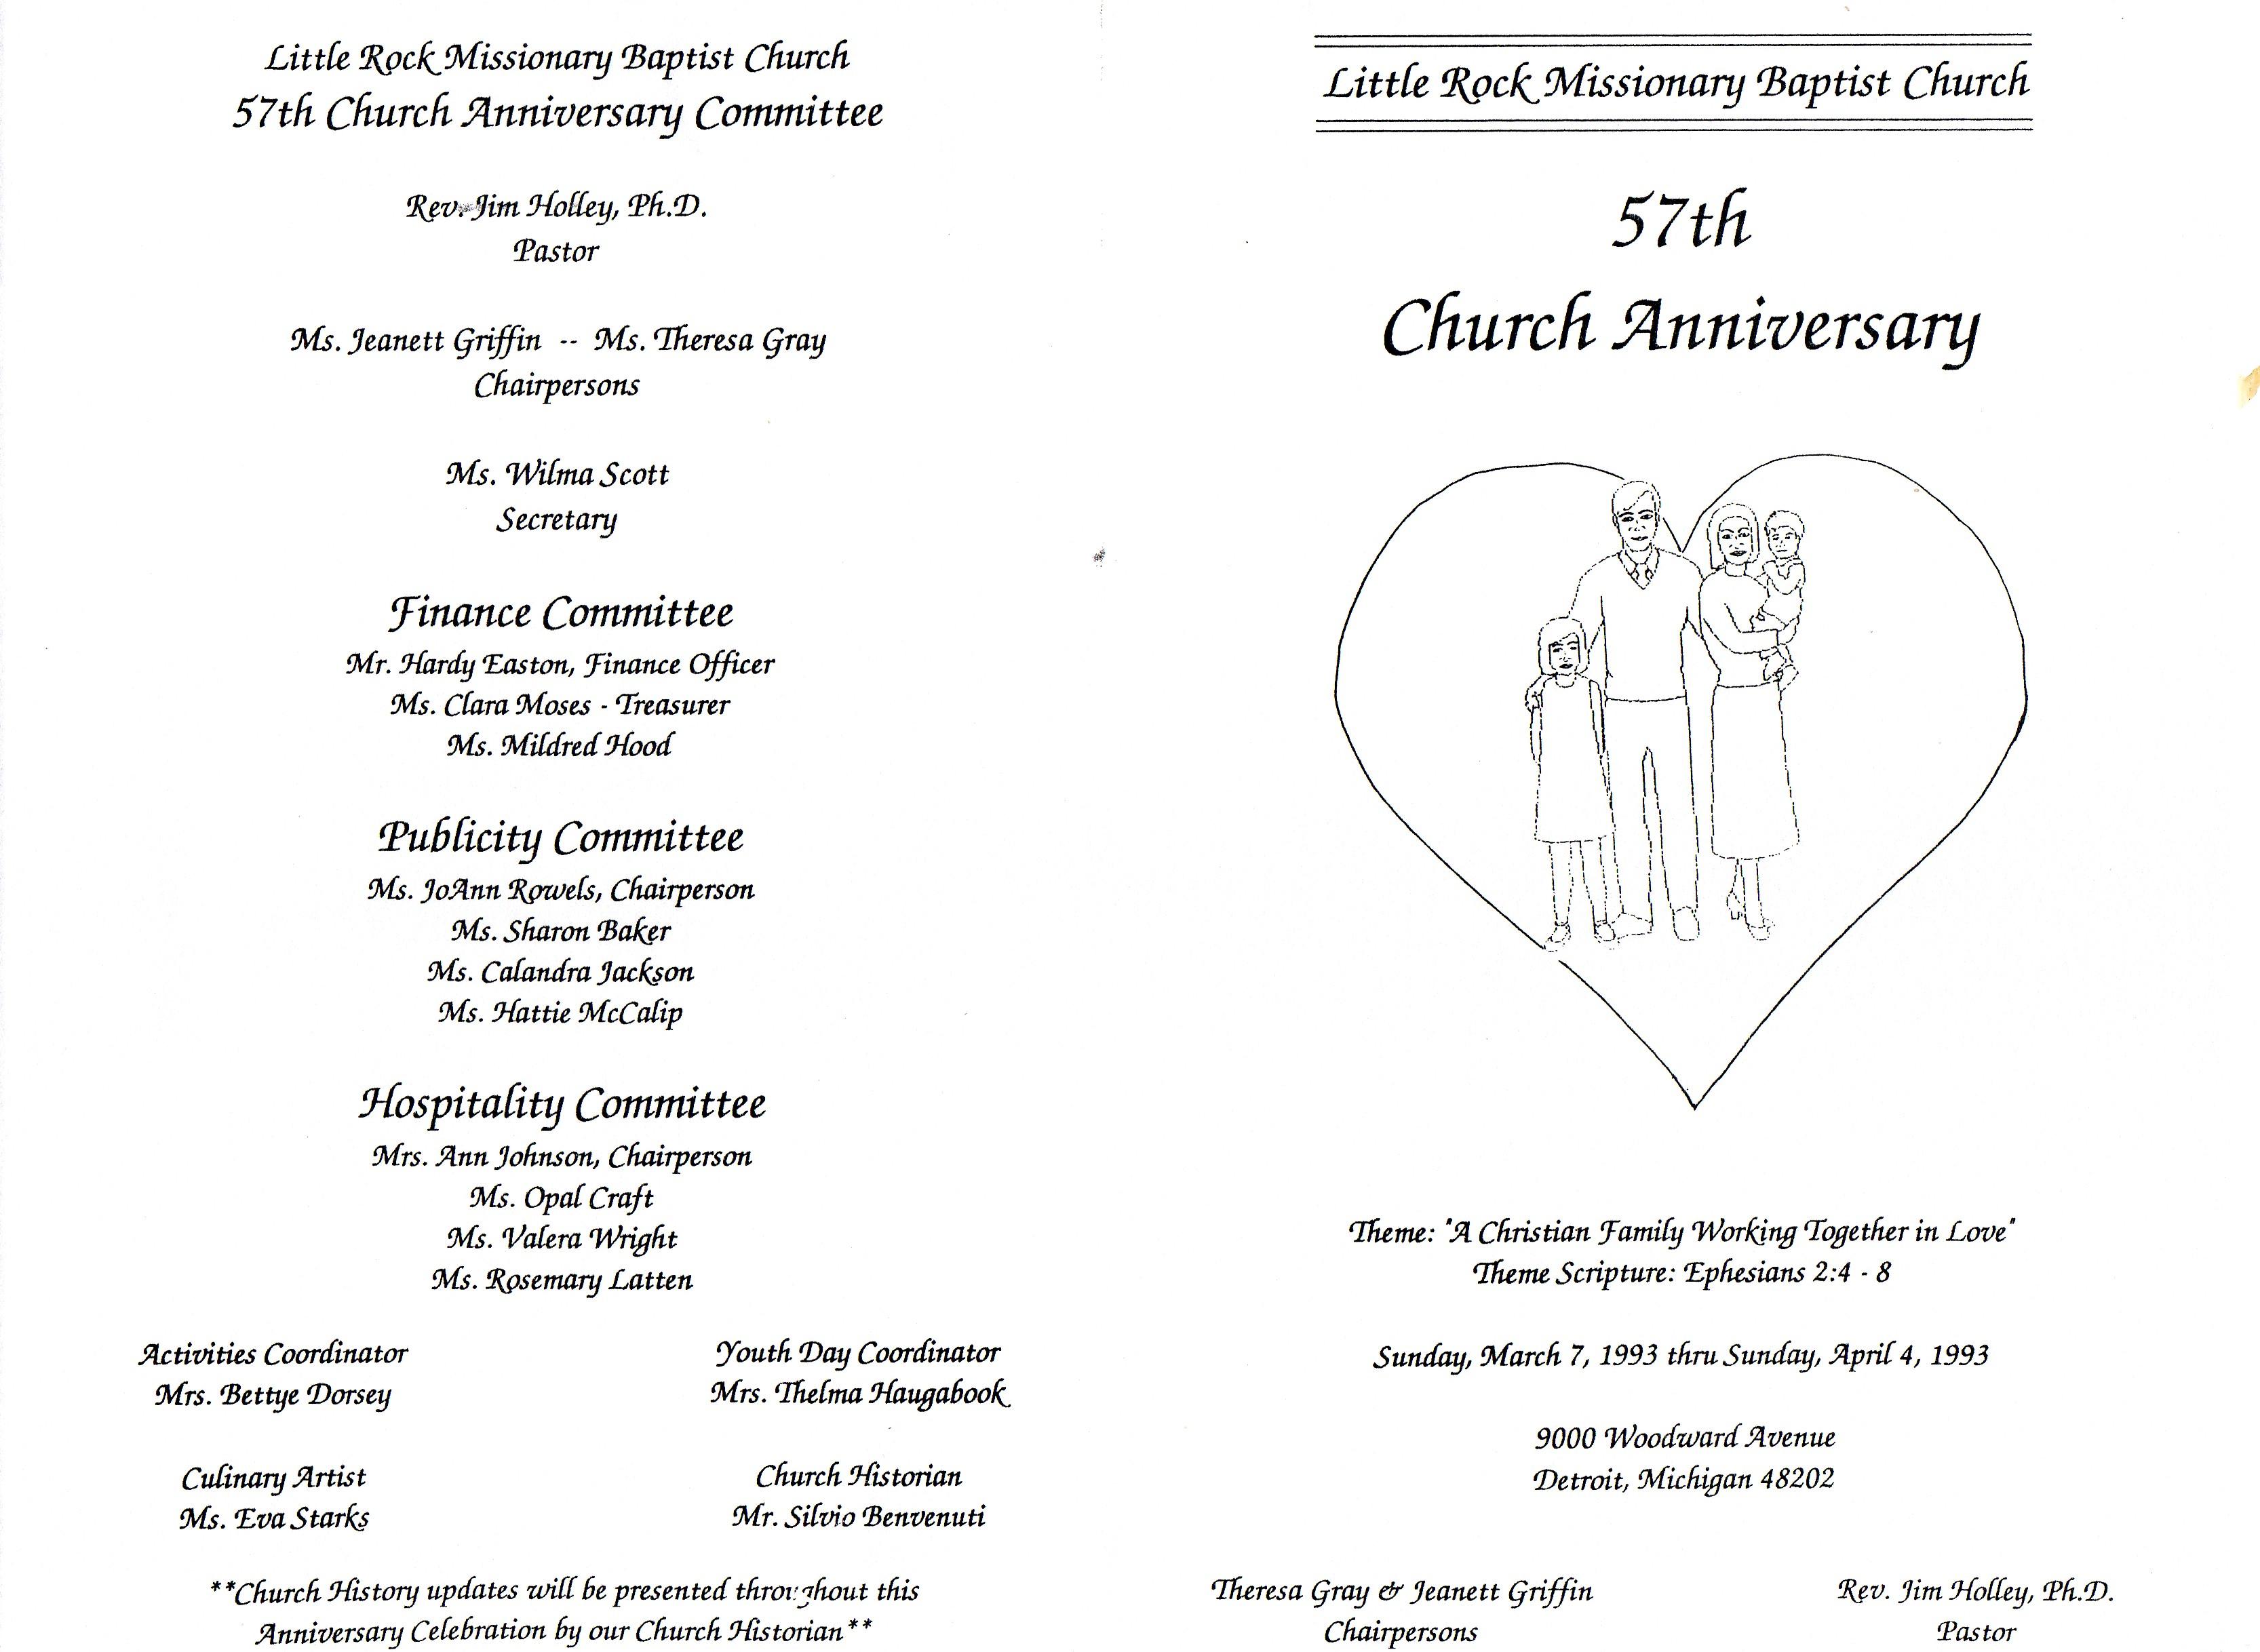 Little Rock Baptist Church 57th Anniversary Program